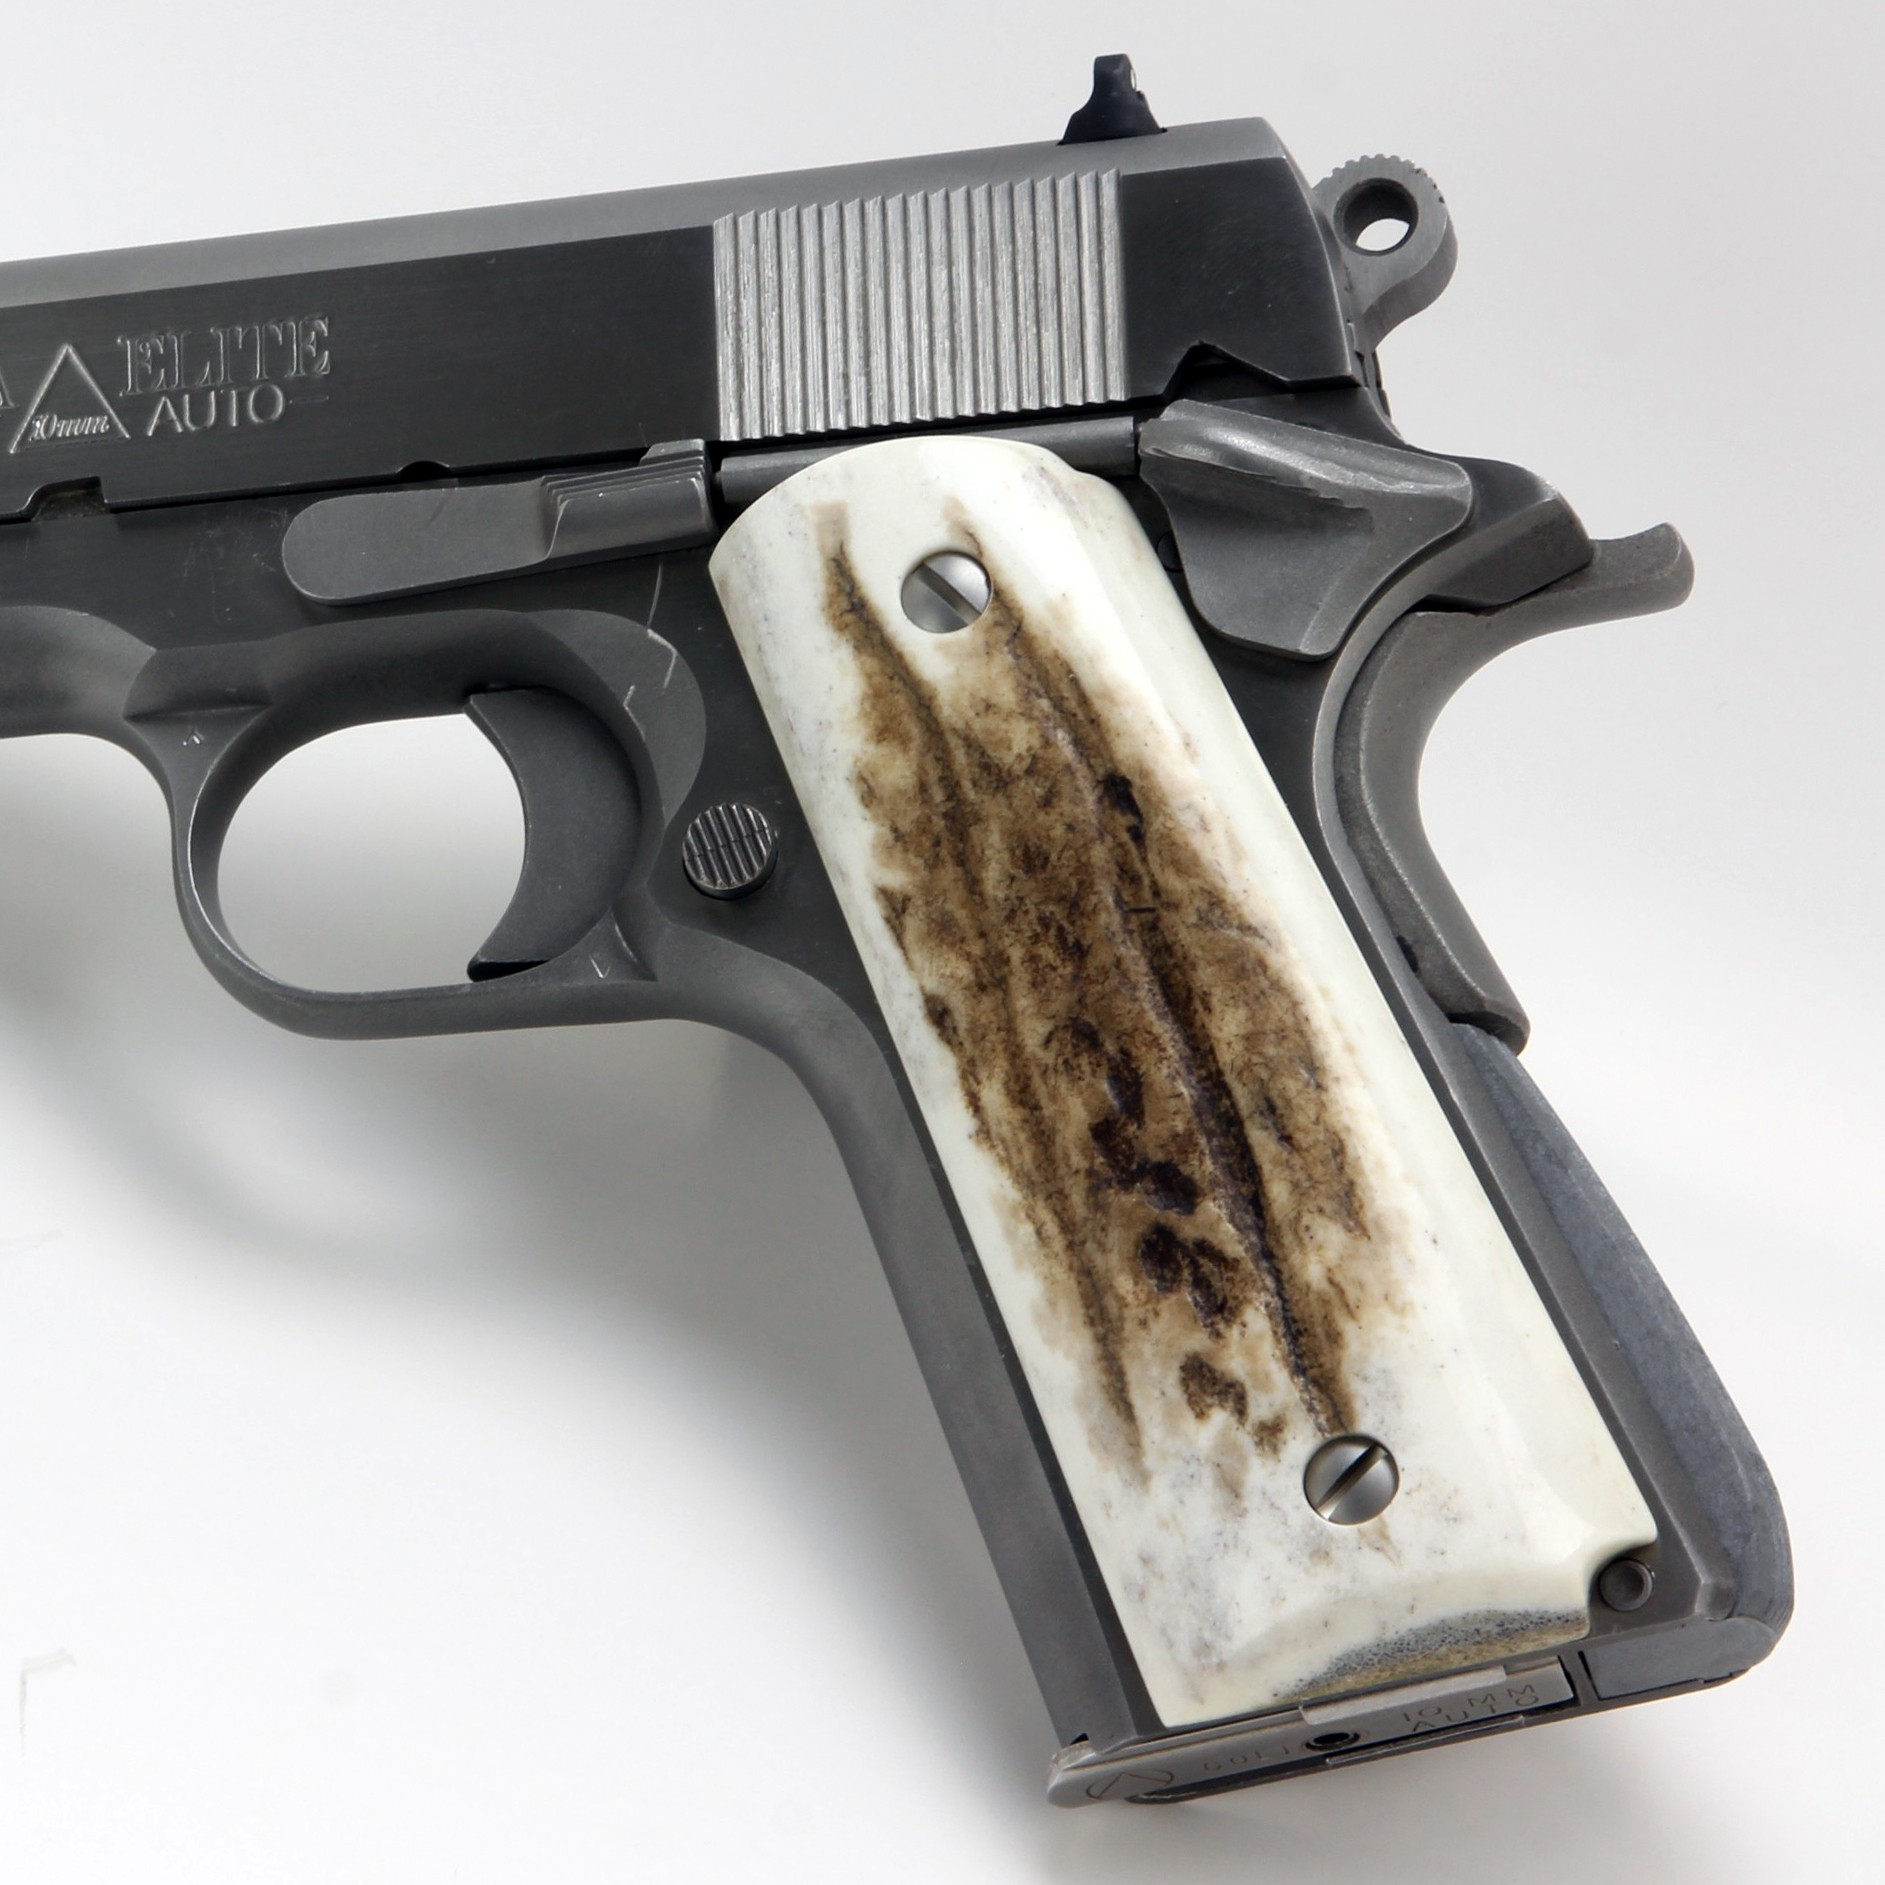 Colt 1911 grips